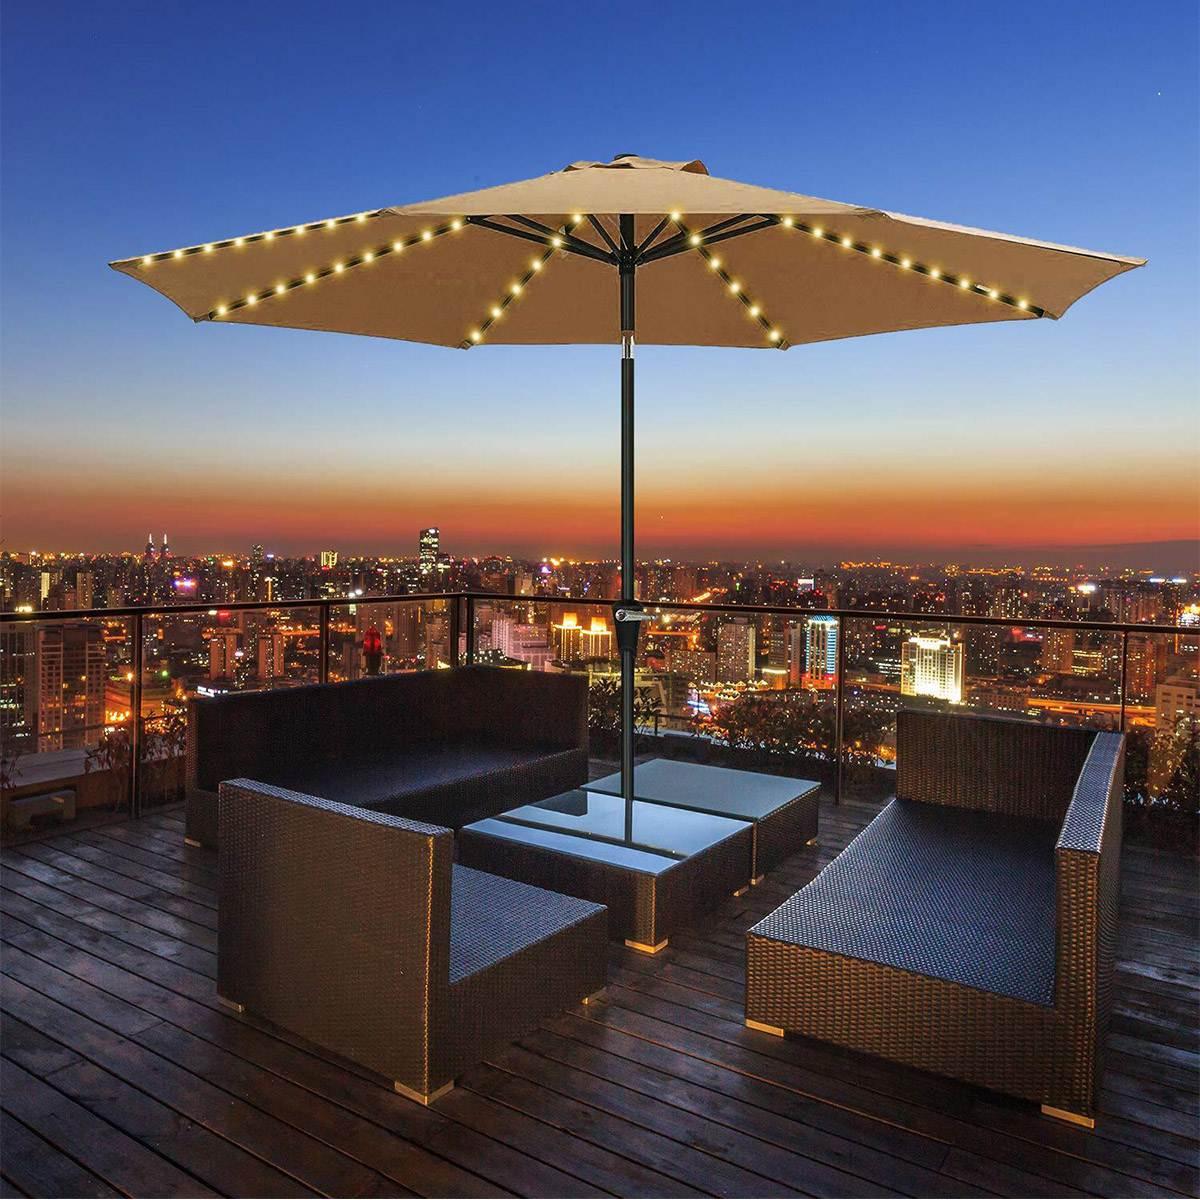 104, sombrilla LED para Patio, sombrilla de jardín, lámpara de cadena LED IP67, Iluminación para exteriores impermeable, luz de decoración Flexible